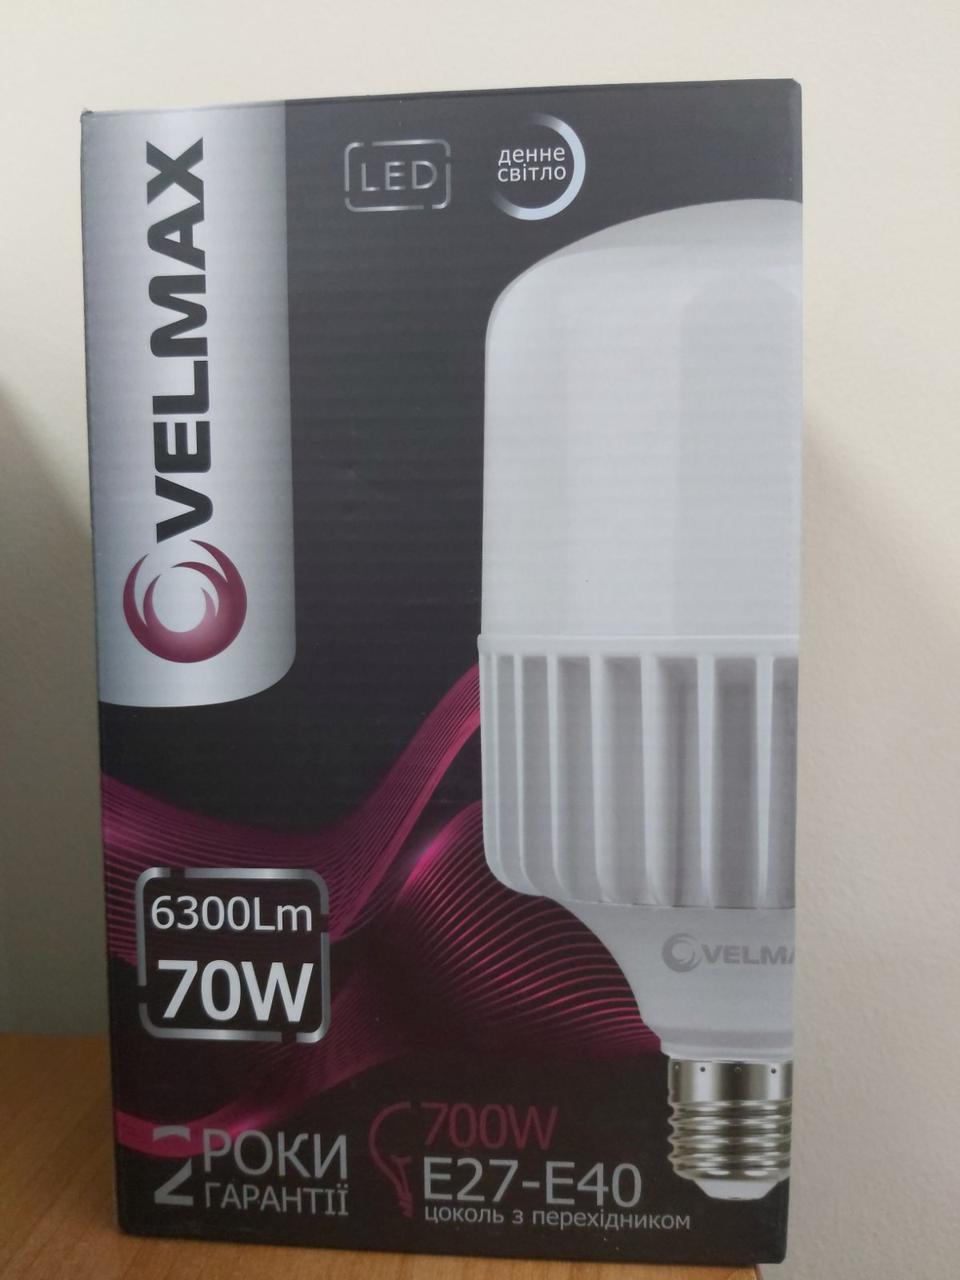 LED ЛАМПА VELMAX V-A135, 70W, Е27-E40, 6500K, 6300LM